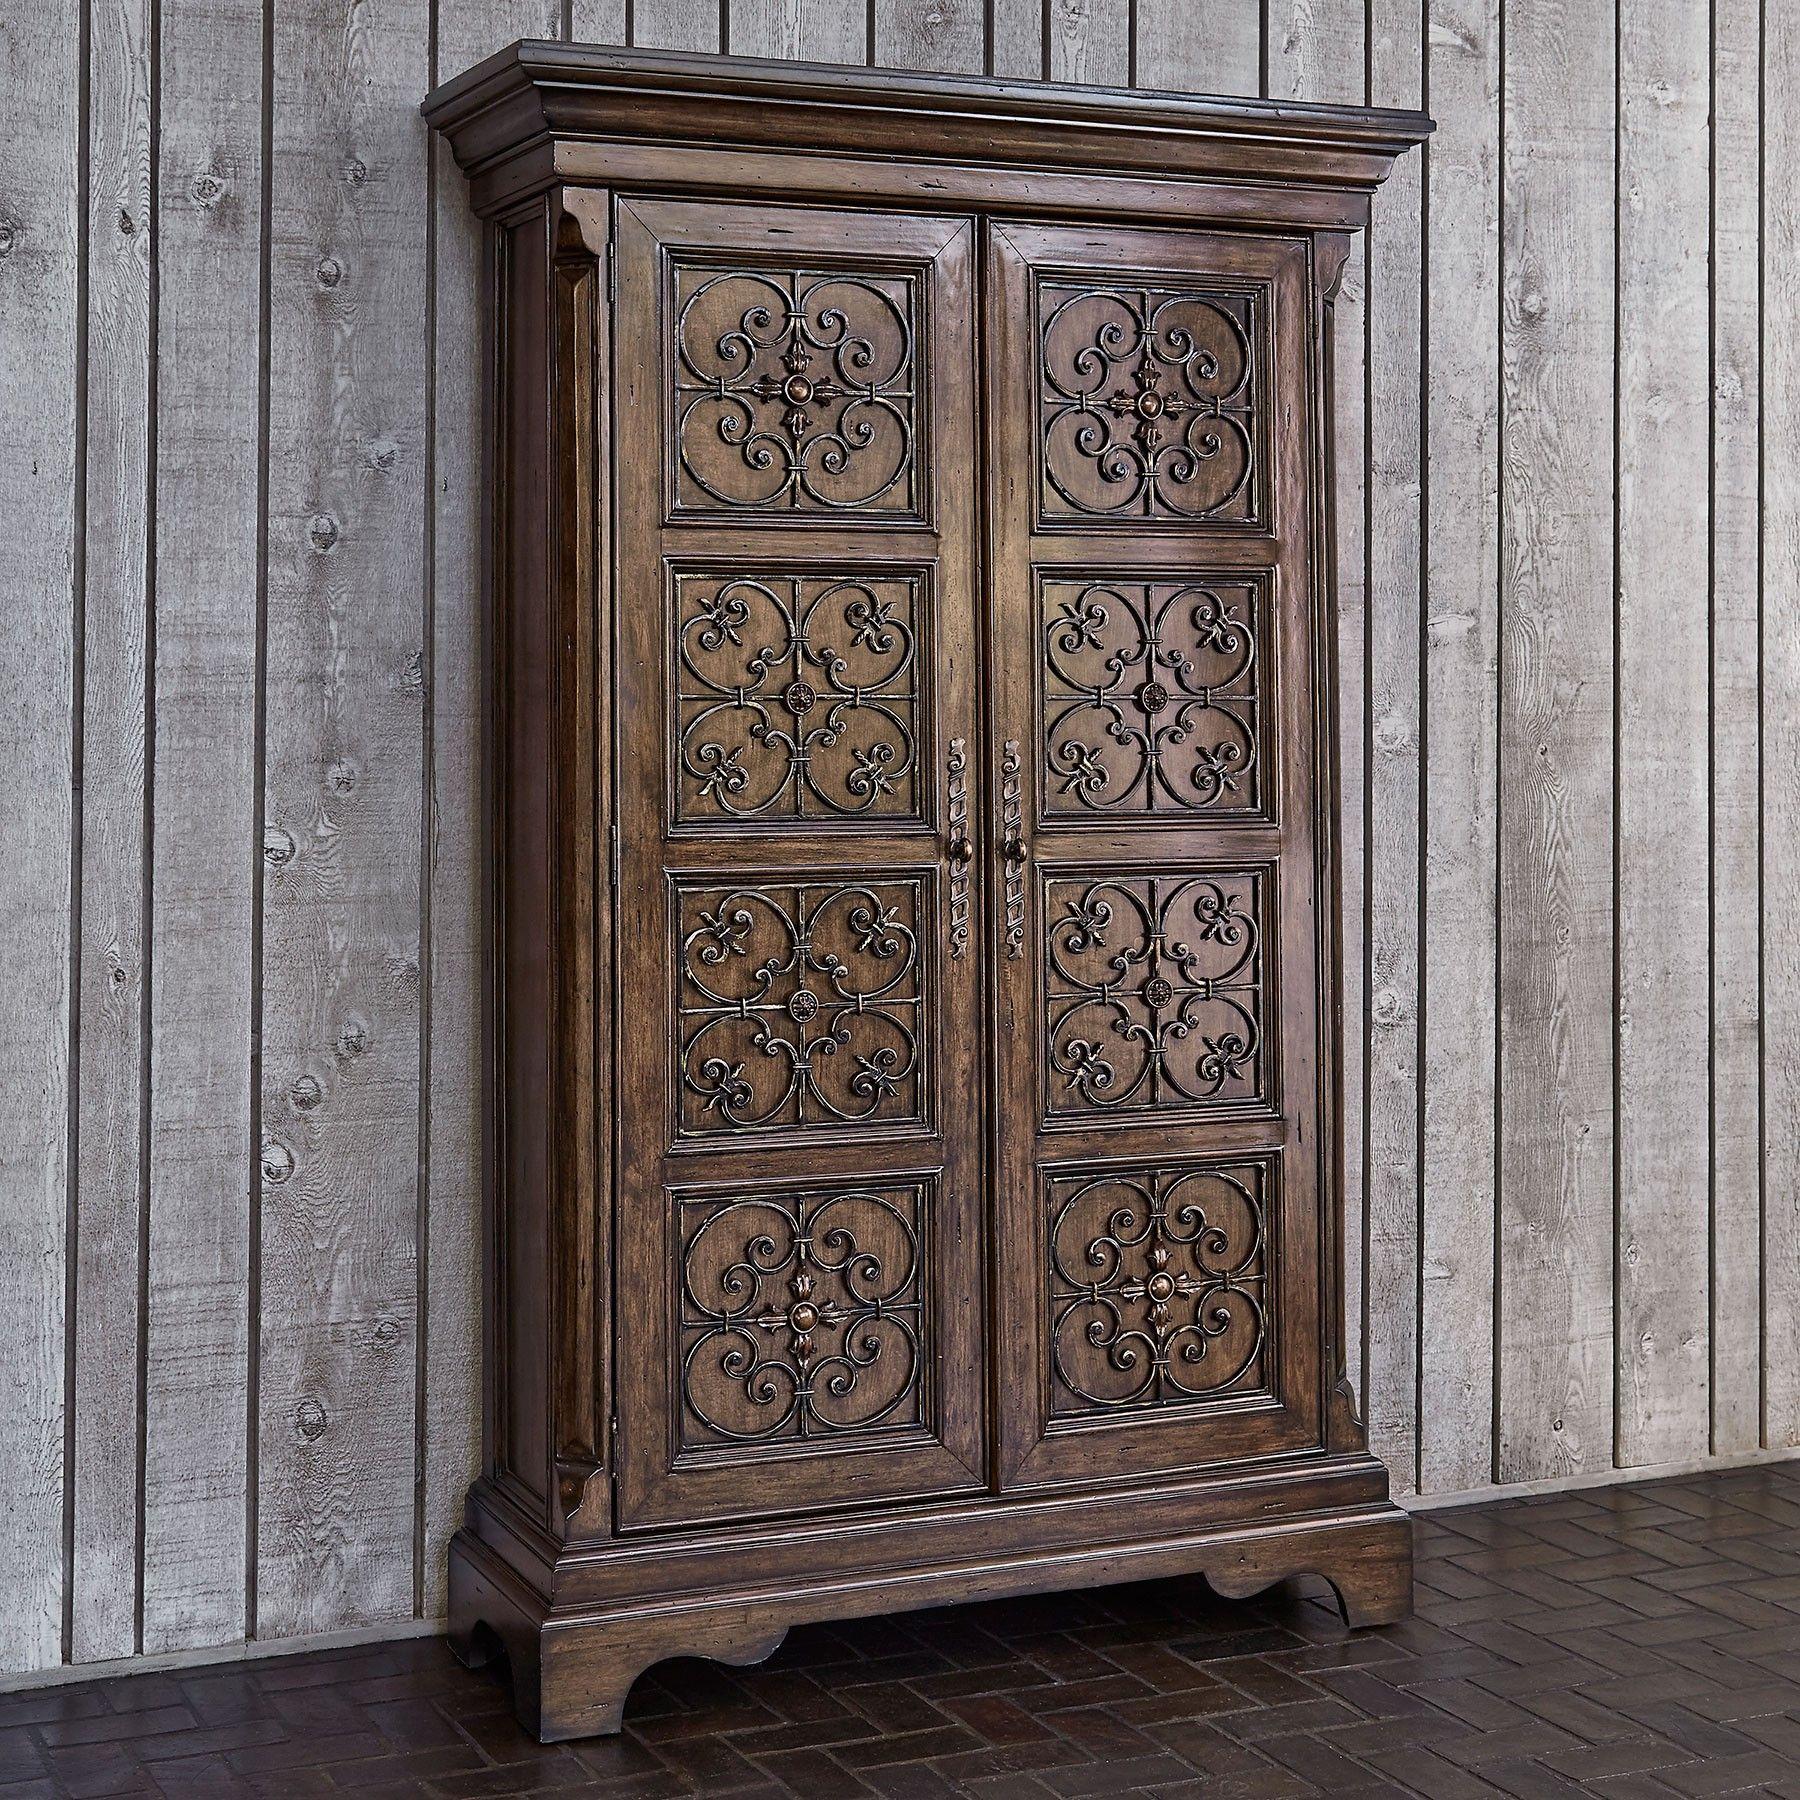 Madrid Armoire   Mindi Wood With Had Wrought Iron Panels. Medium Brown Distressed  Wood Finish